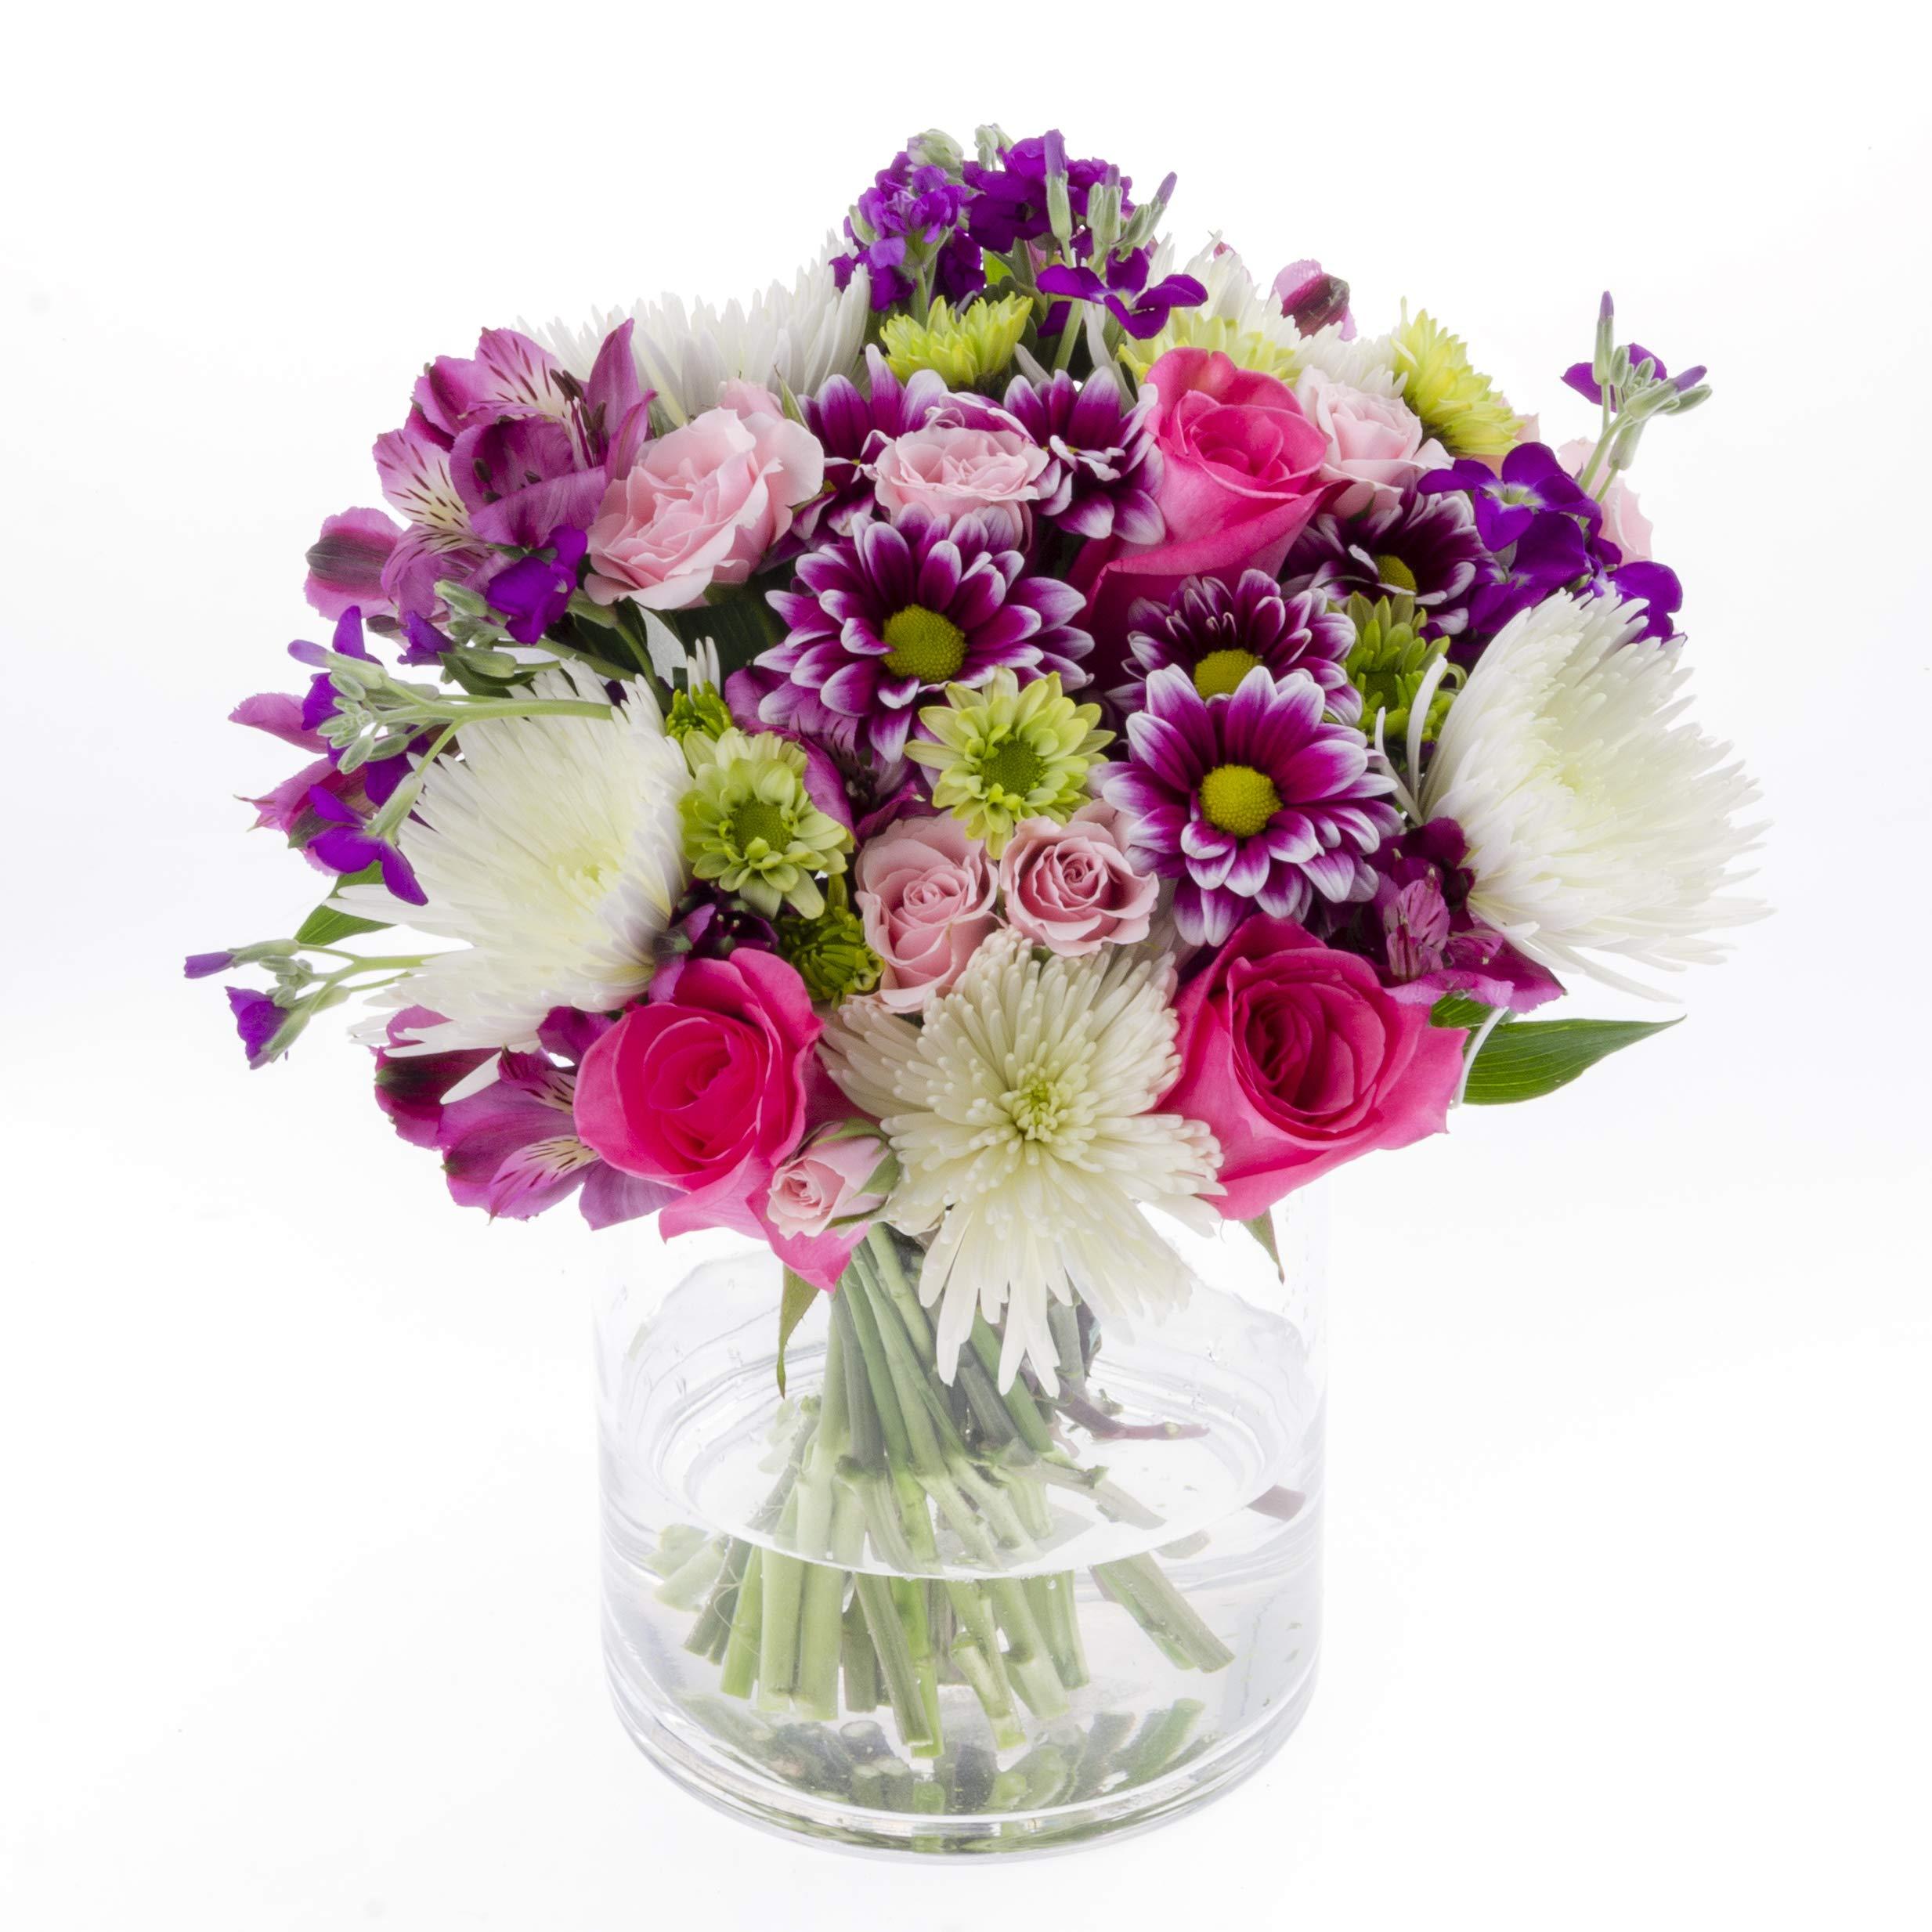 Vistaflor - Promise Vase Floral Arrangement by eFlowy